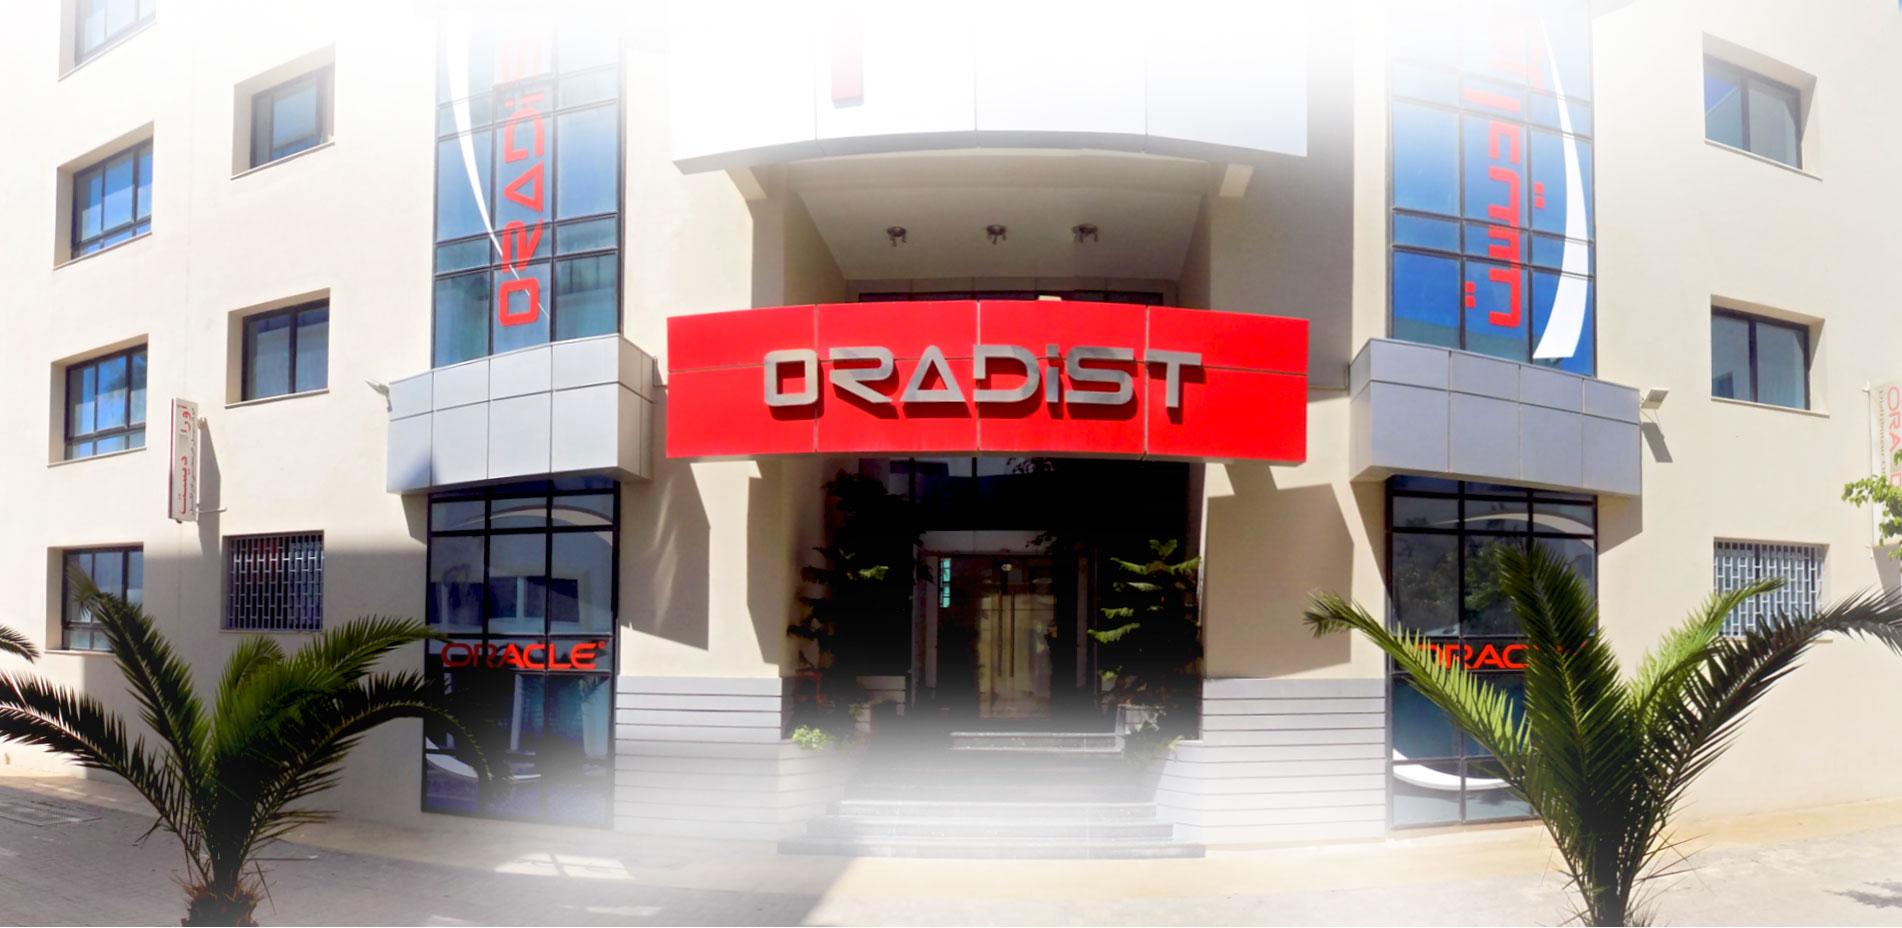 oradist-ORADIST1-bckground